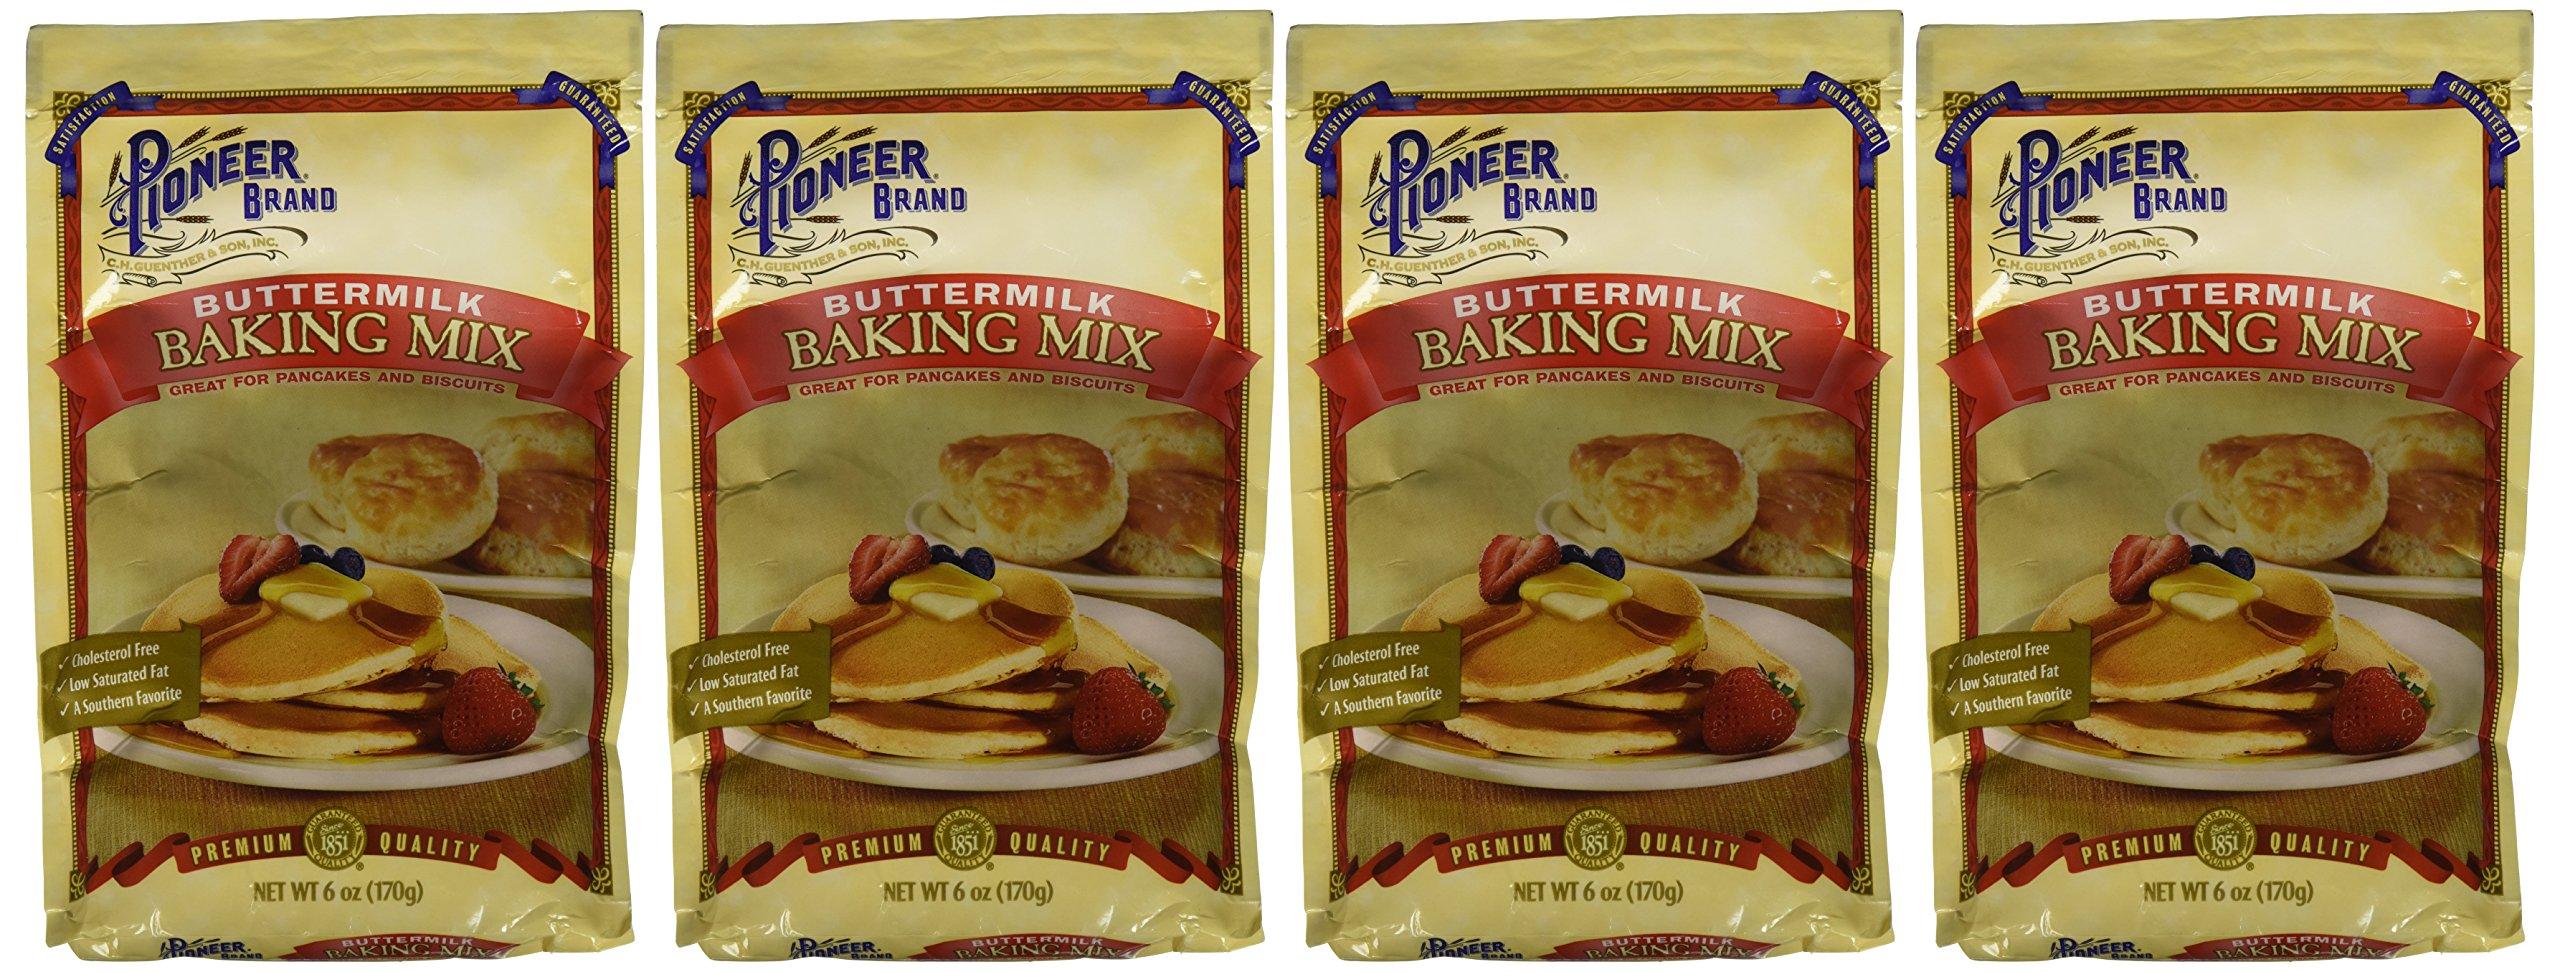 Pioneer Buttermilk Biscuit & Baking Mix, 6 Oz (4 Pack)